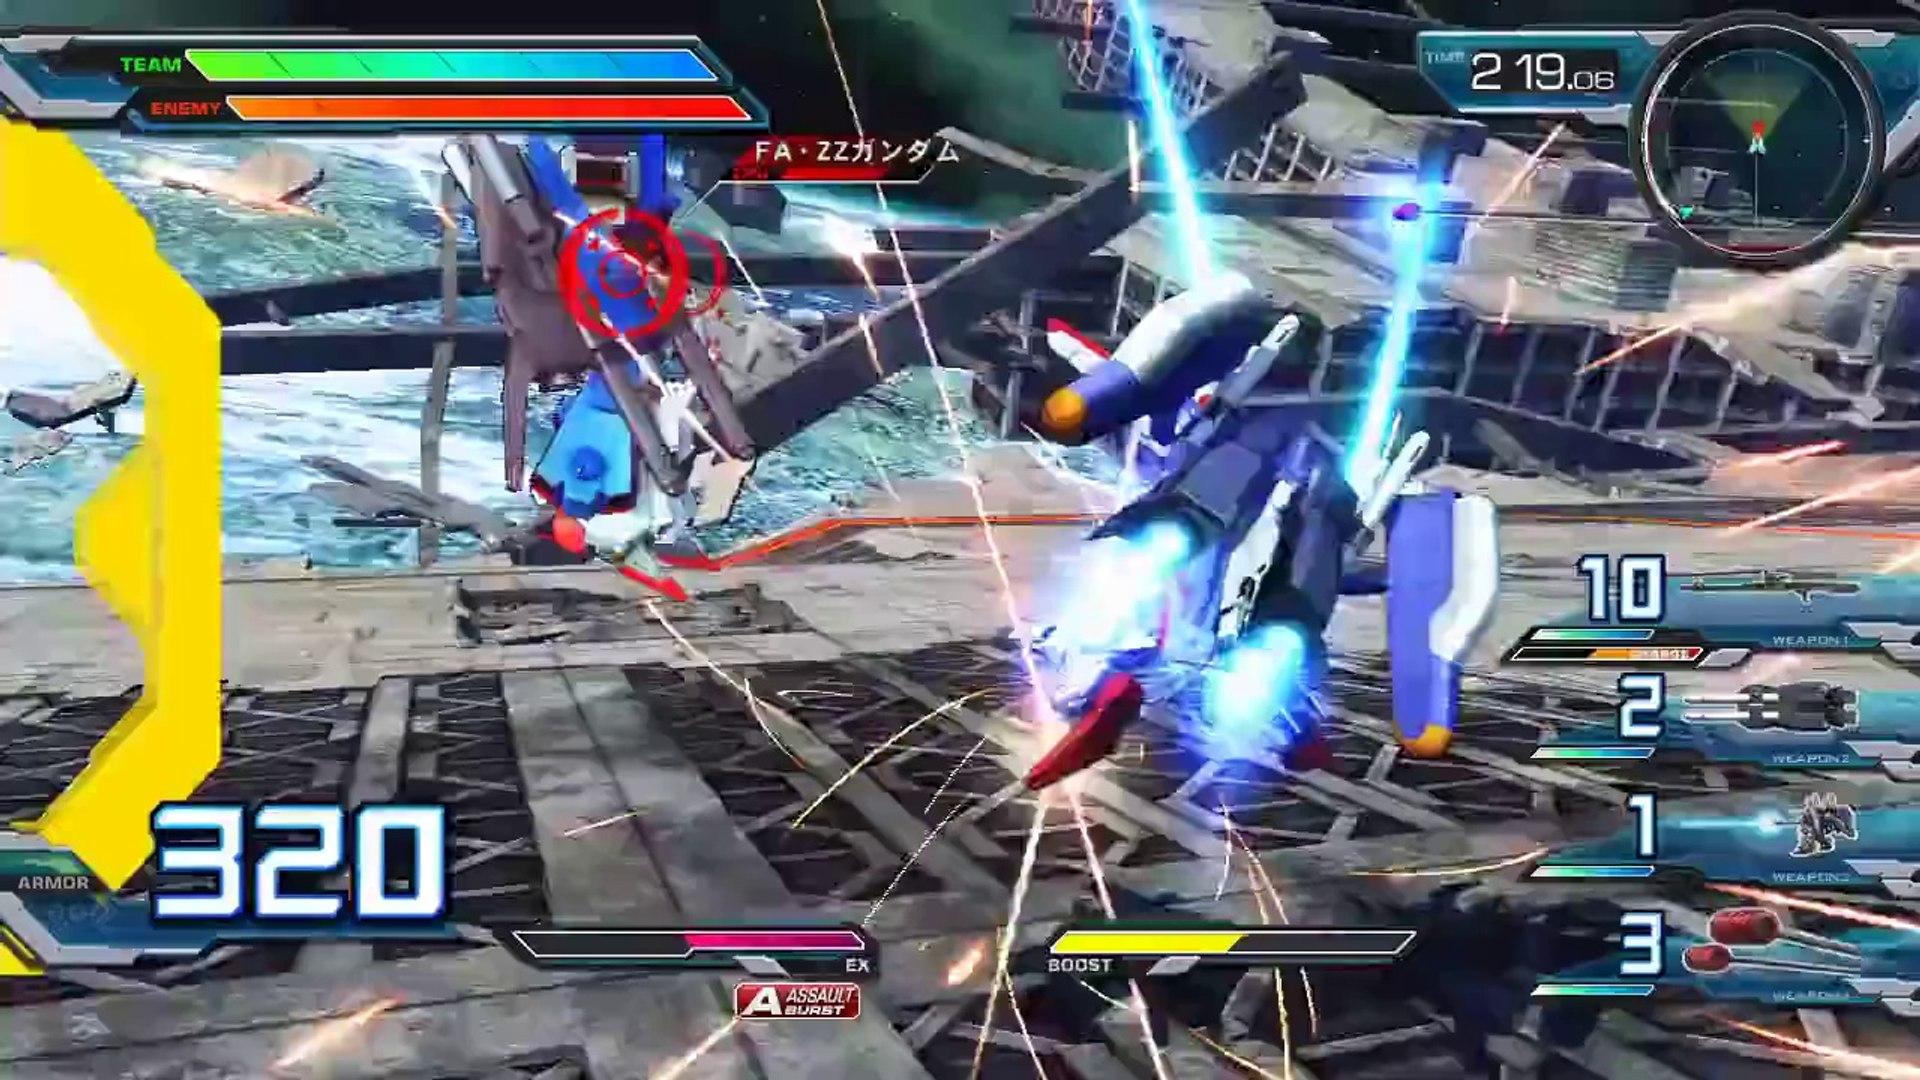 Mobile Suit Gundam Extreme Vs Full Boost Ex S Gundam Video Dailymotion